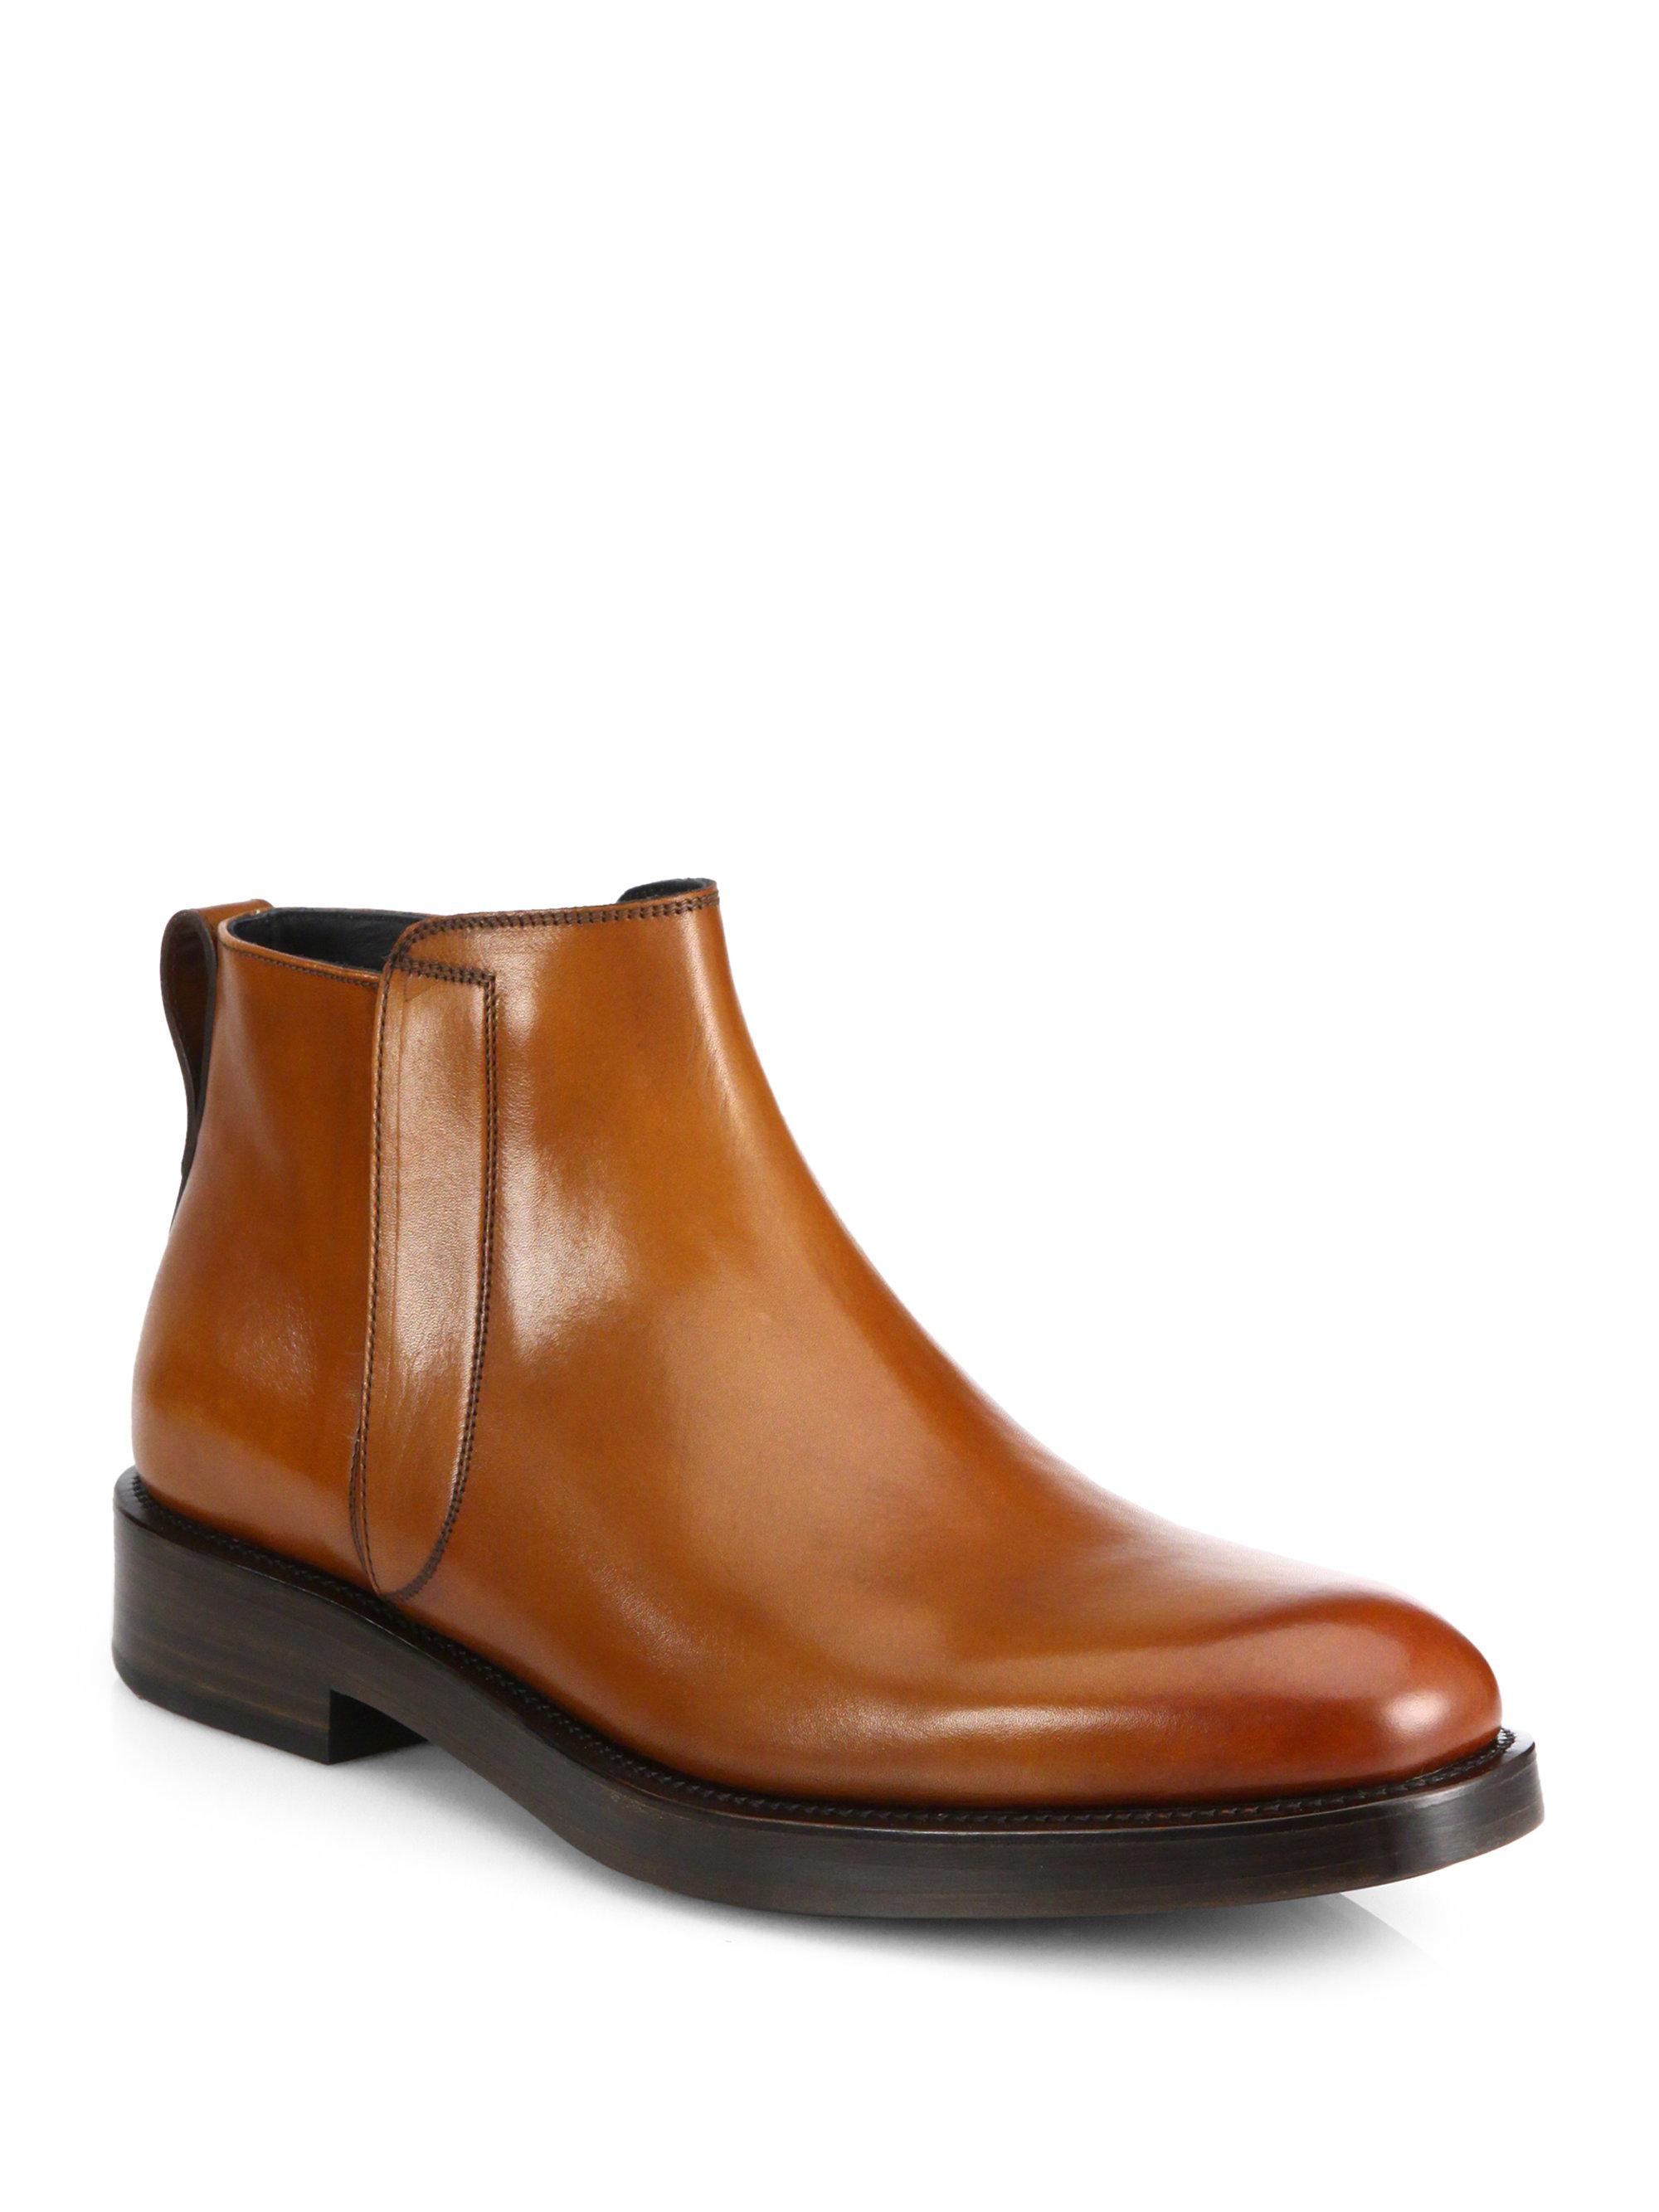 Ferragamo Poem Chelsea Boots In Brown For Men Lyst